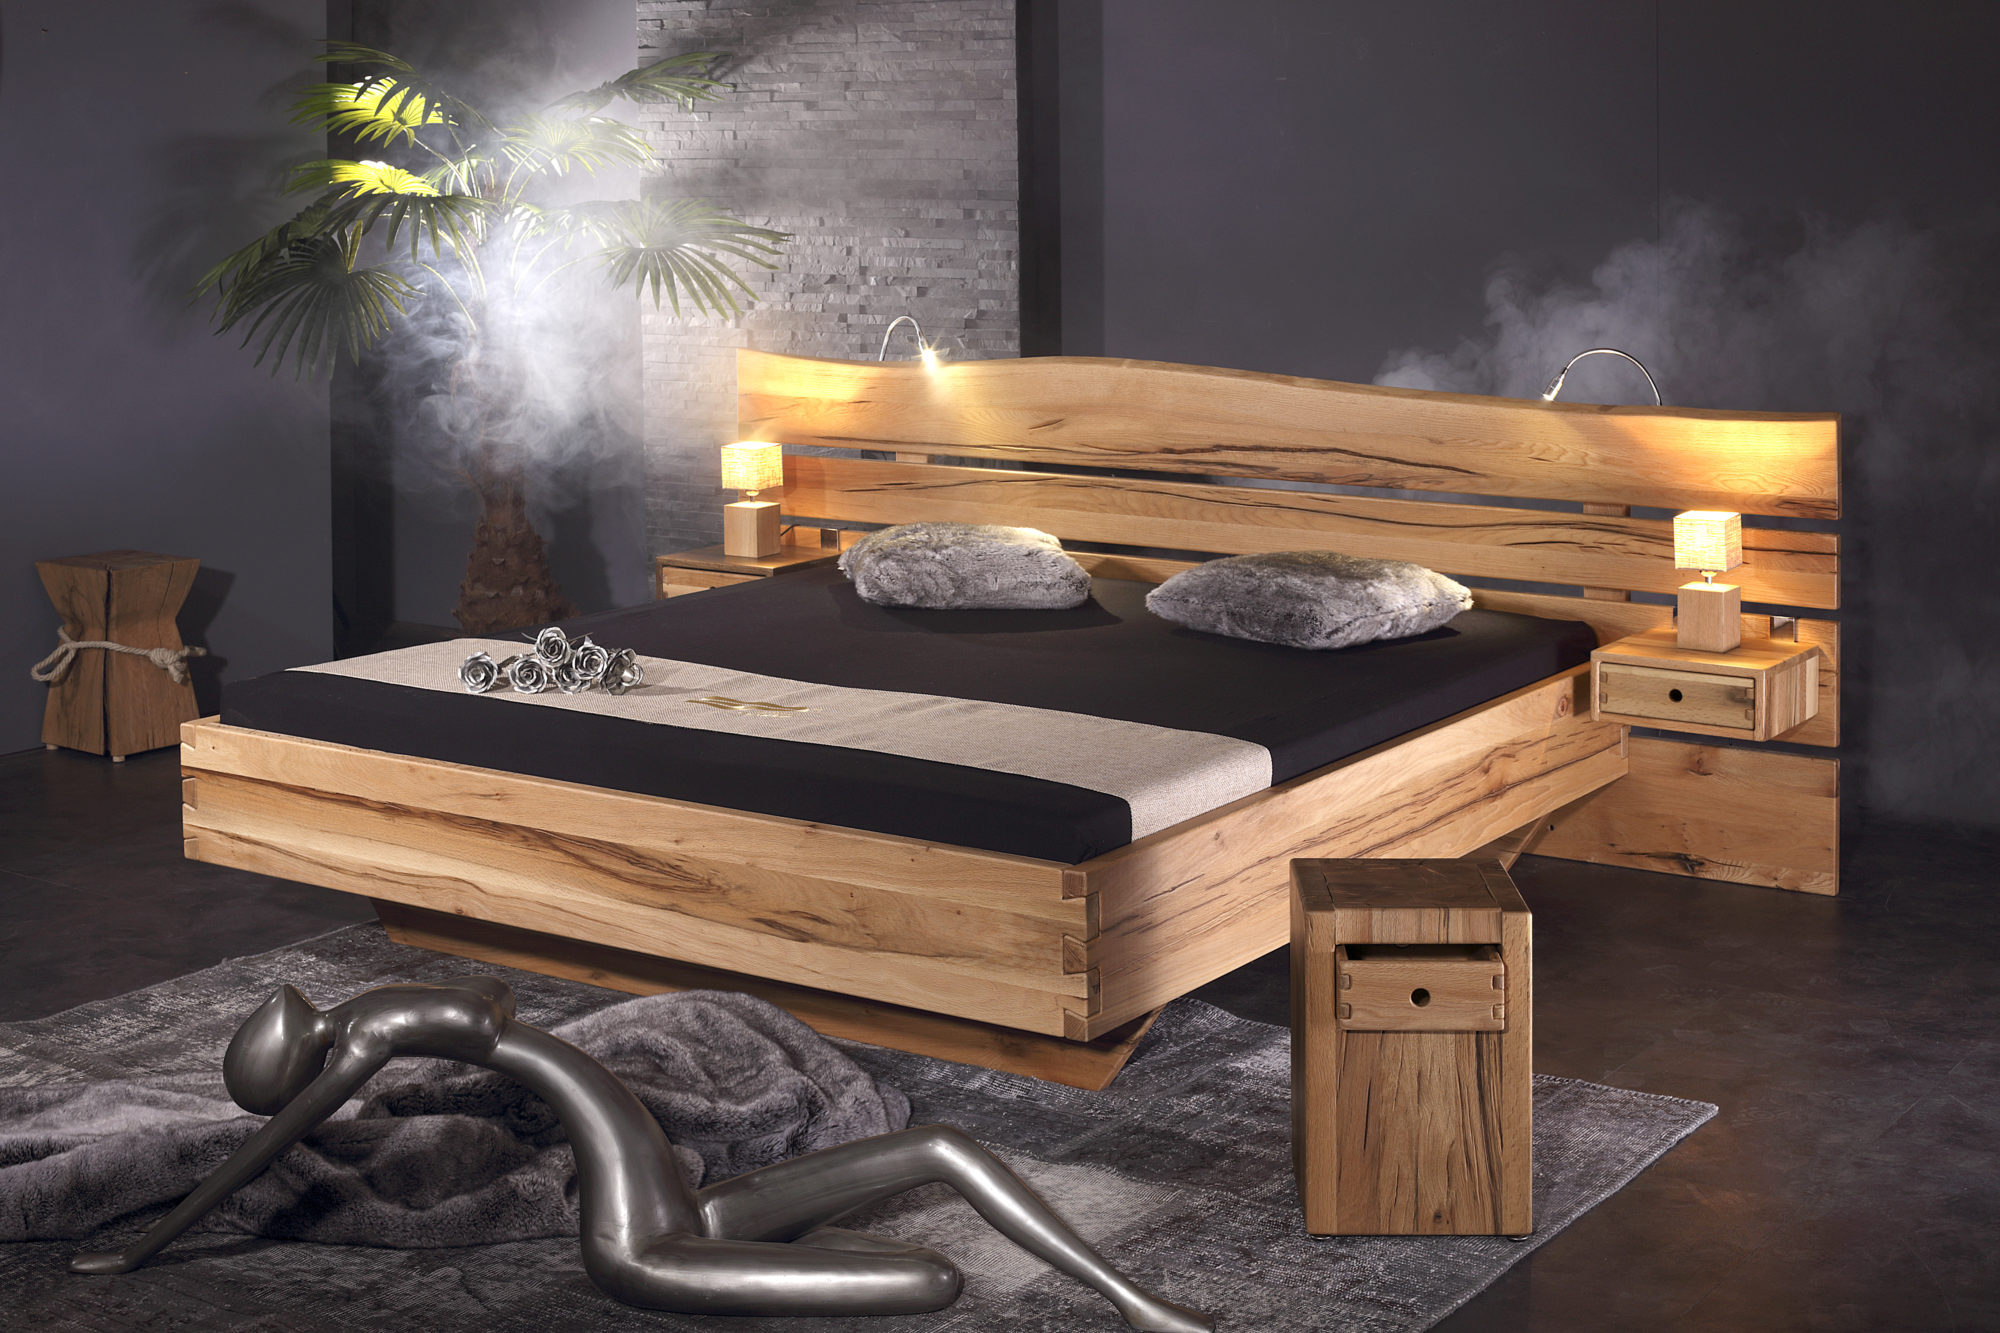 bett rosenheim sumpfeiche sprenger m bel. Black Bedroom Furniture Sets. Home Design Ideas